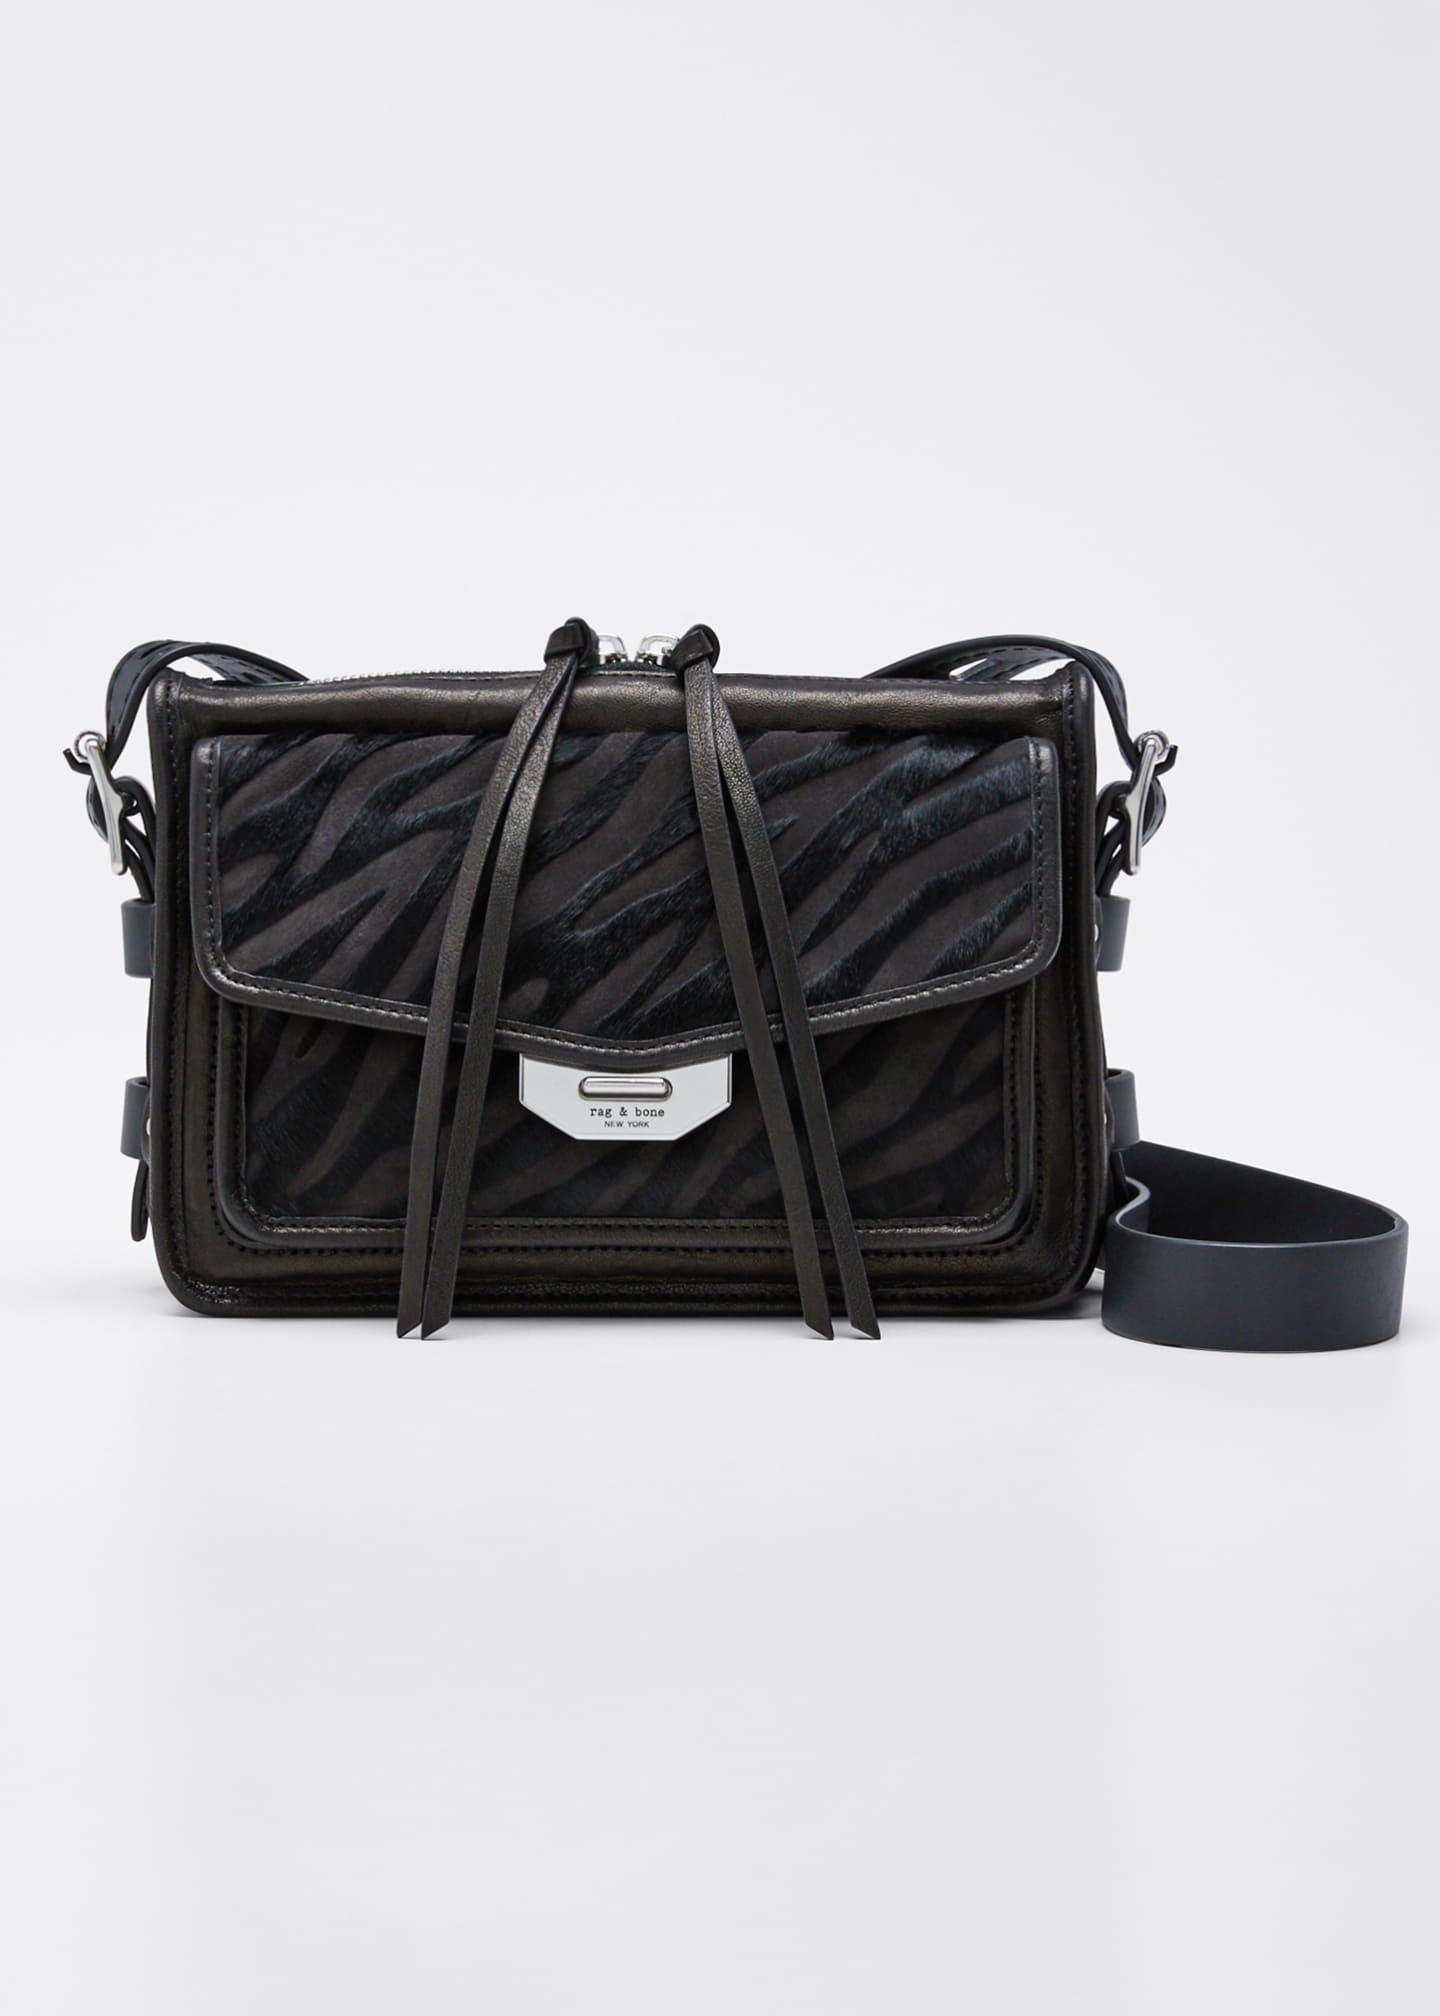 Rag & Bone Small Field Messenger Bag with